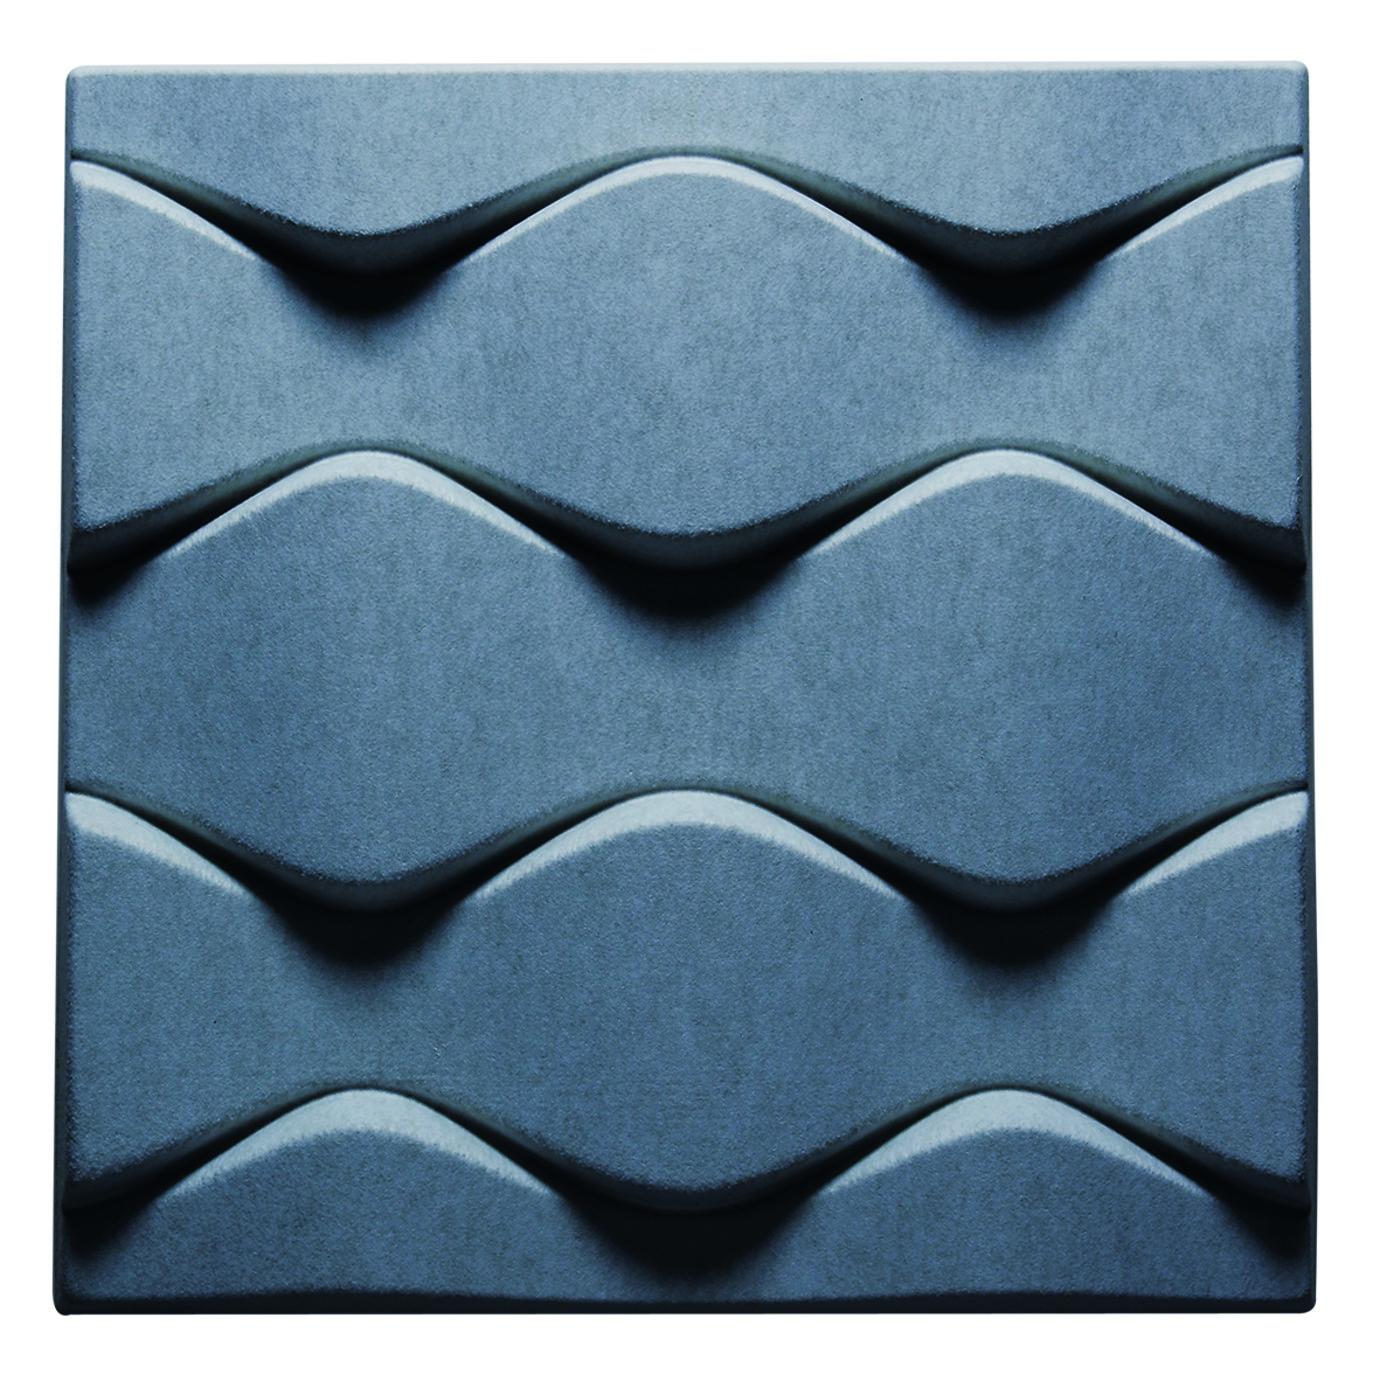 0-Control-Sonido-Paneles-Acusticos-Soundwave-Flo-1380